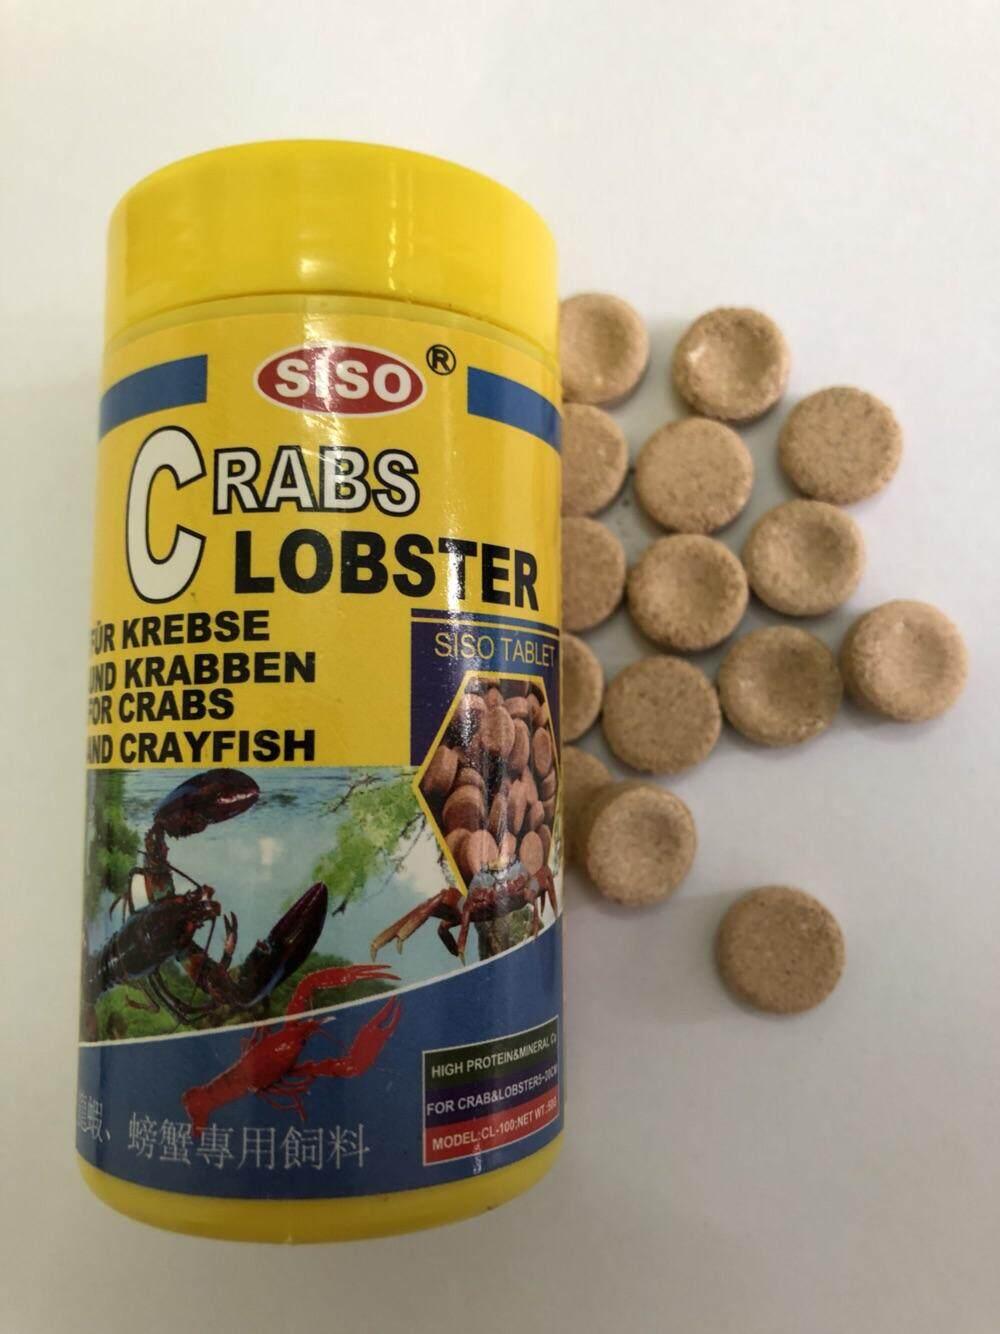 Siso Crabs Lobster Sinking Tablet 50gm Fish Food / Lobster Food / Crab Food